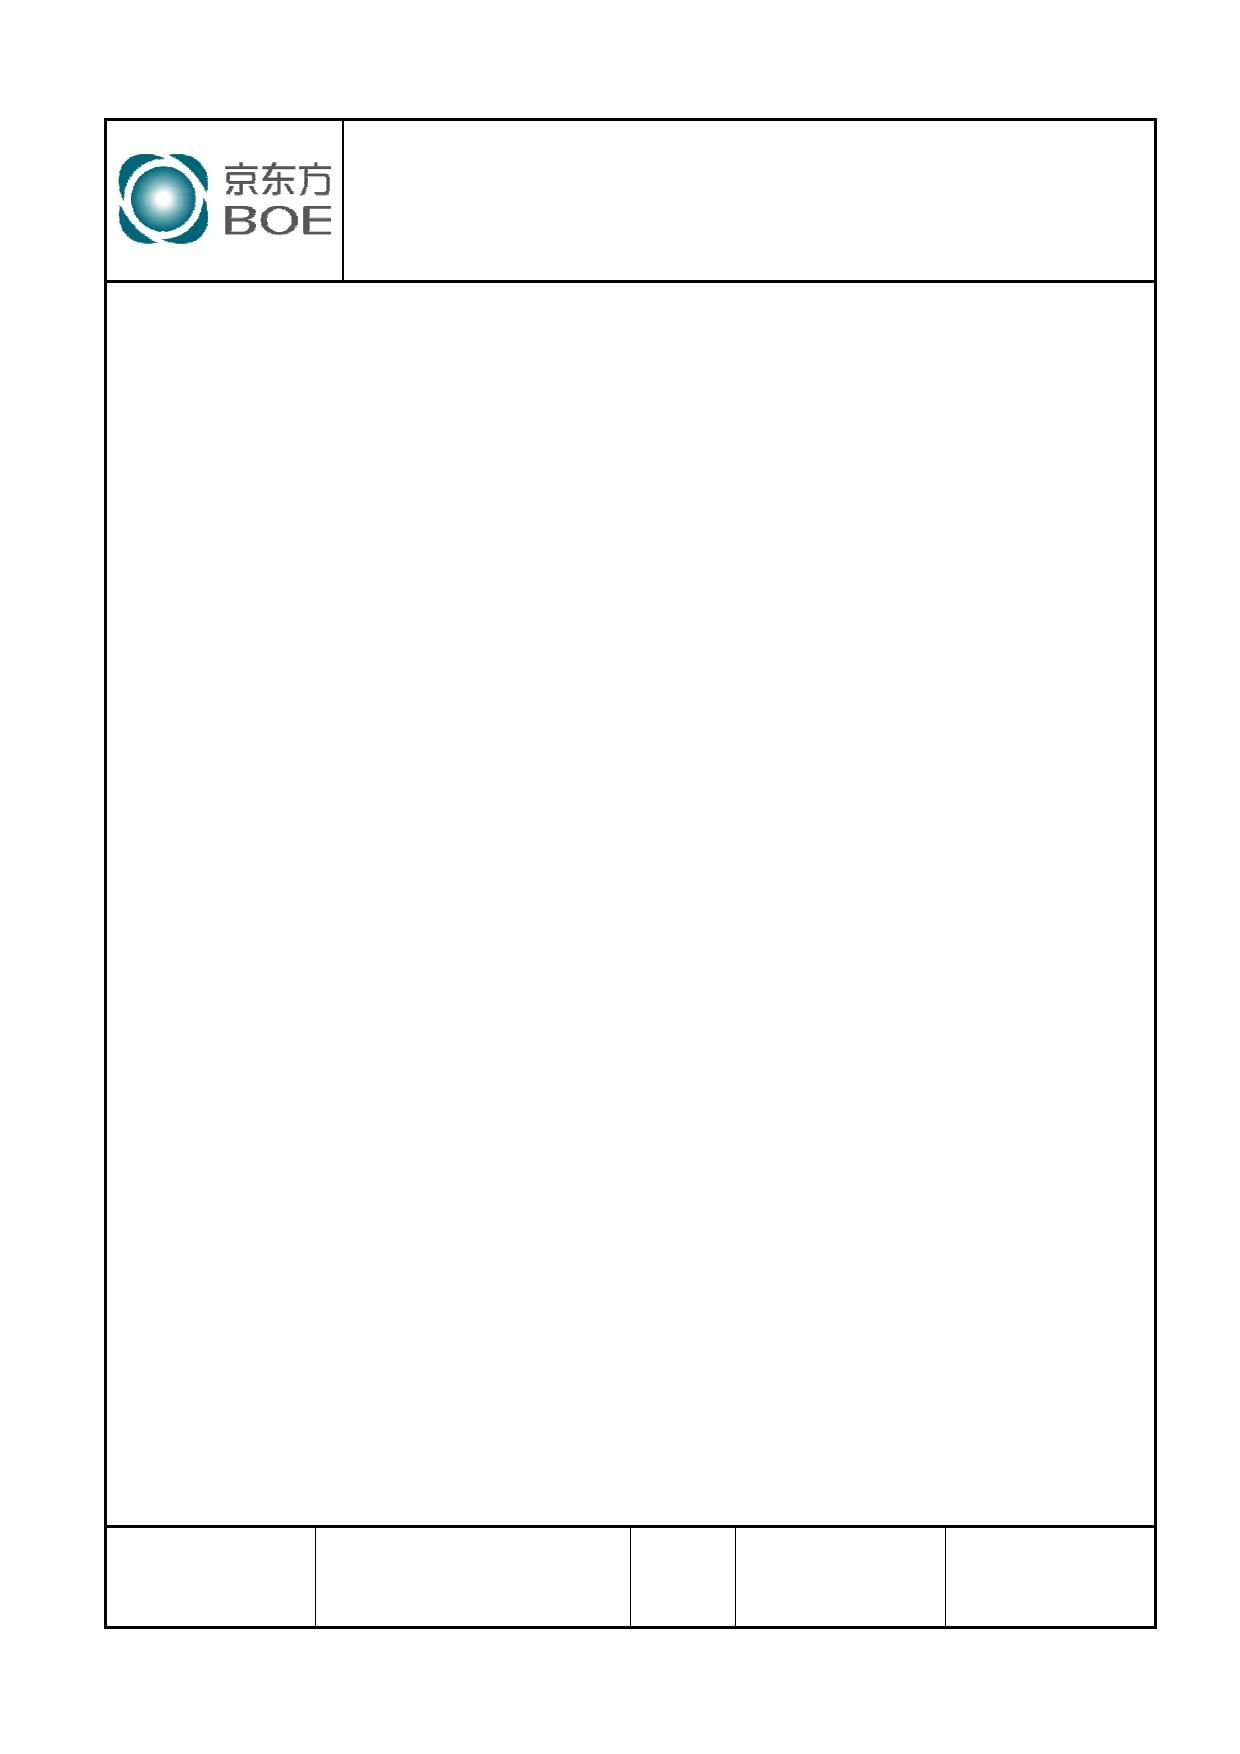 HV104X01-100 Datasheet, HV104X01-100 PDF,ピン配置, 機能